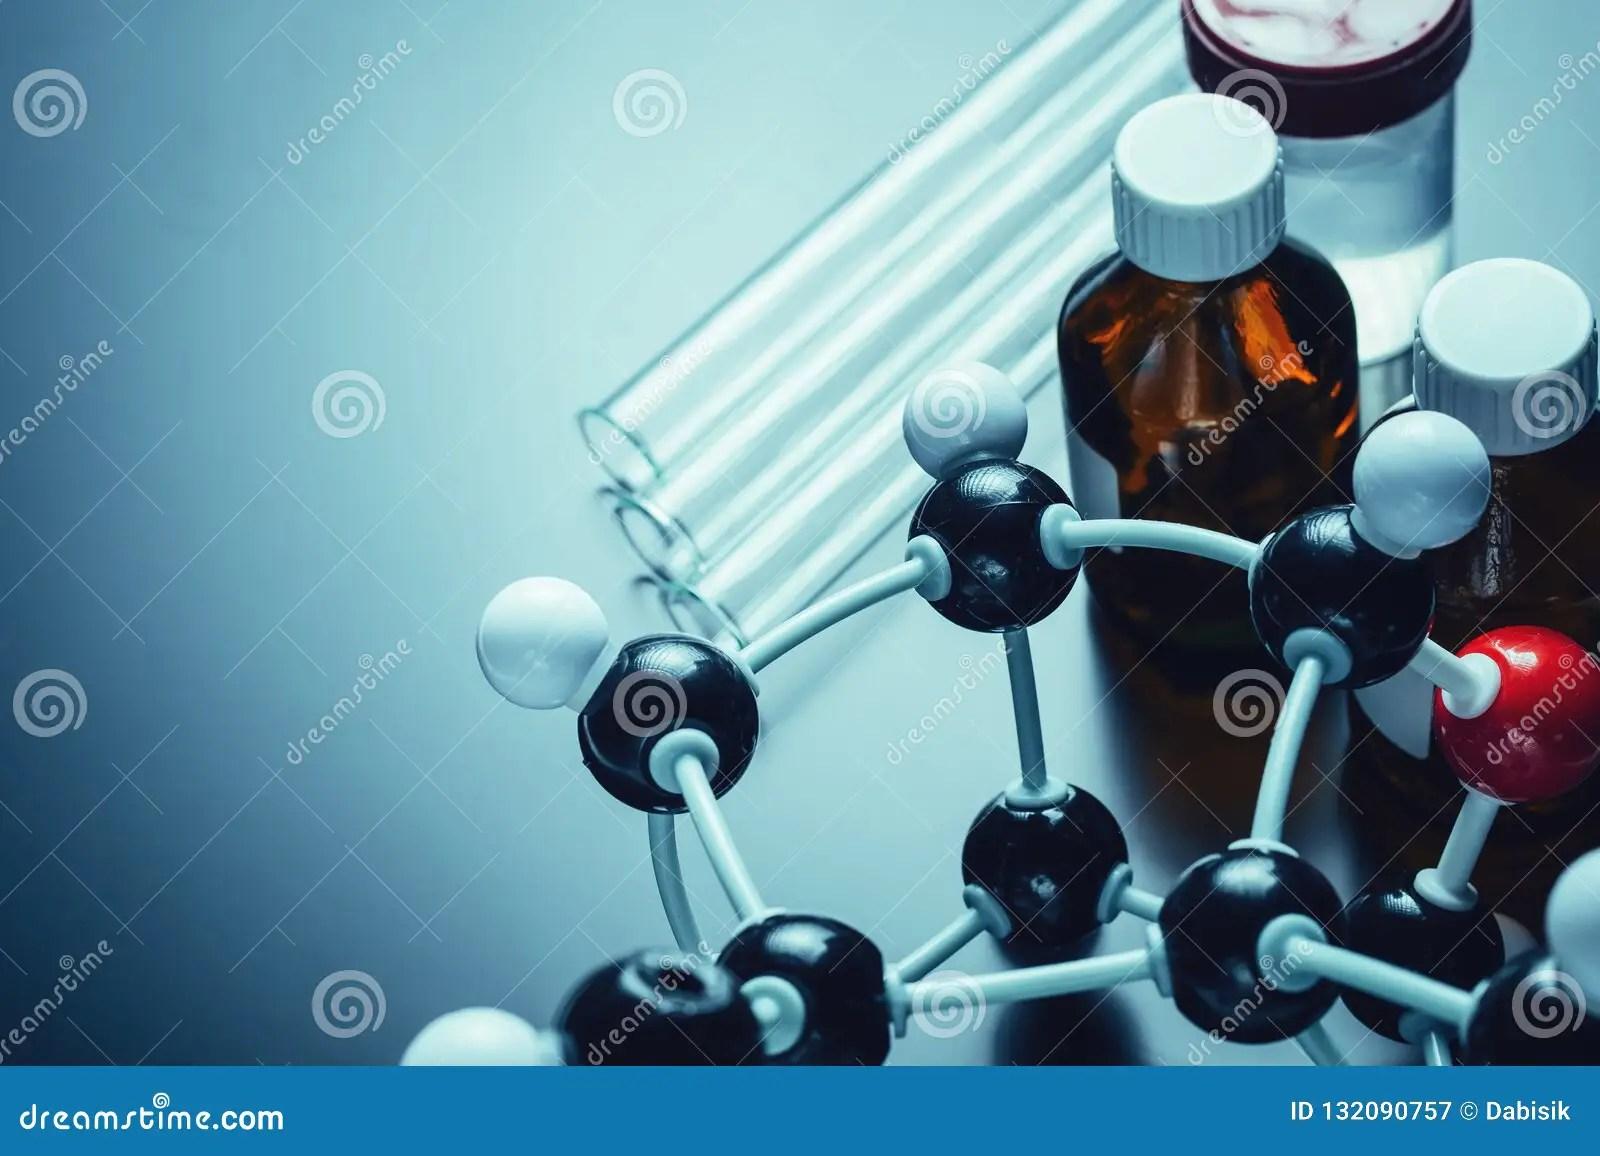 Molecular Formula And Laboratory Equipment On A Dark